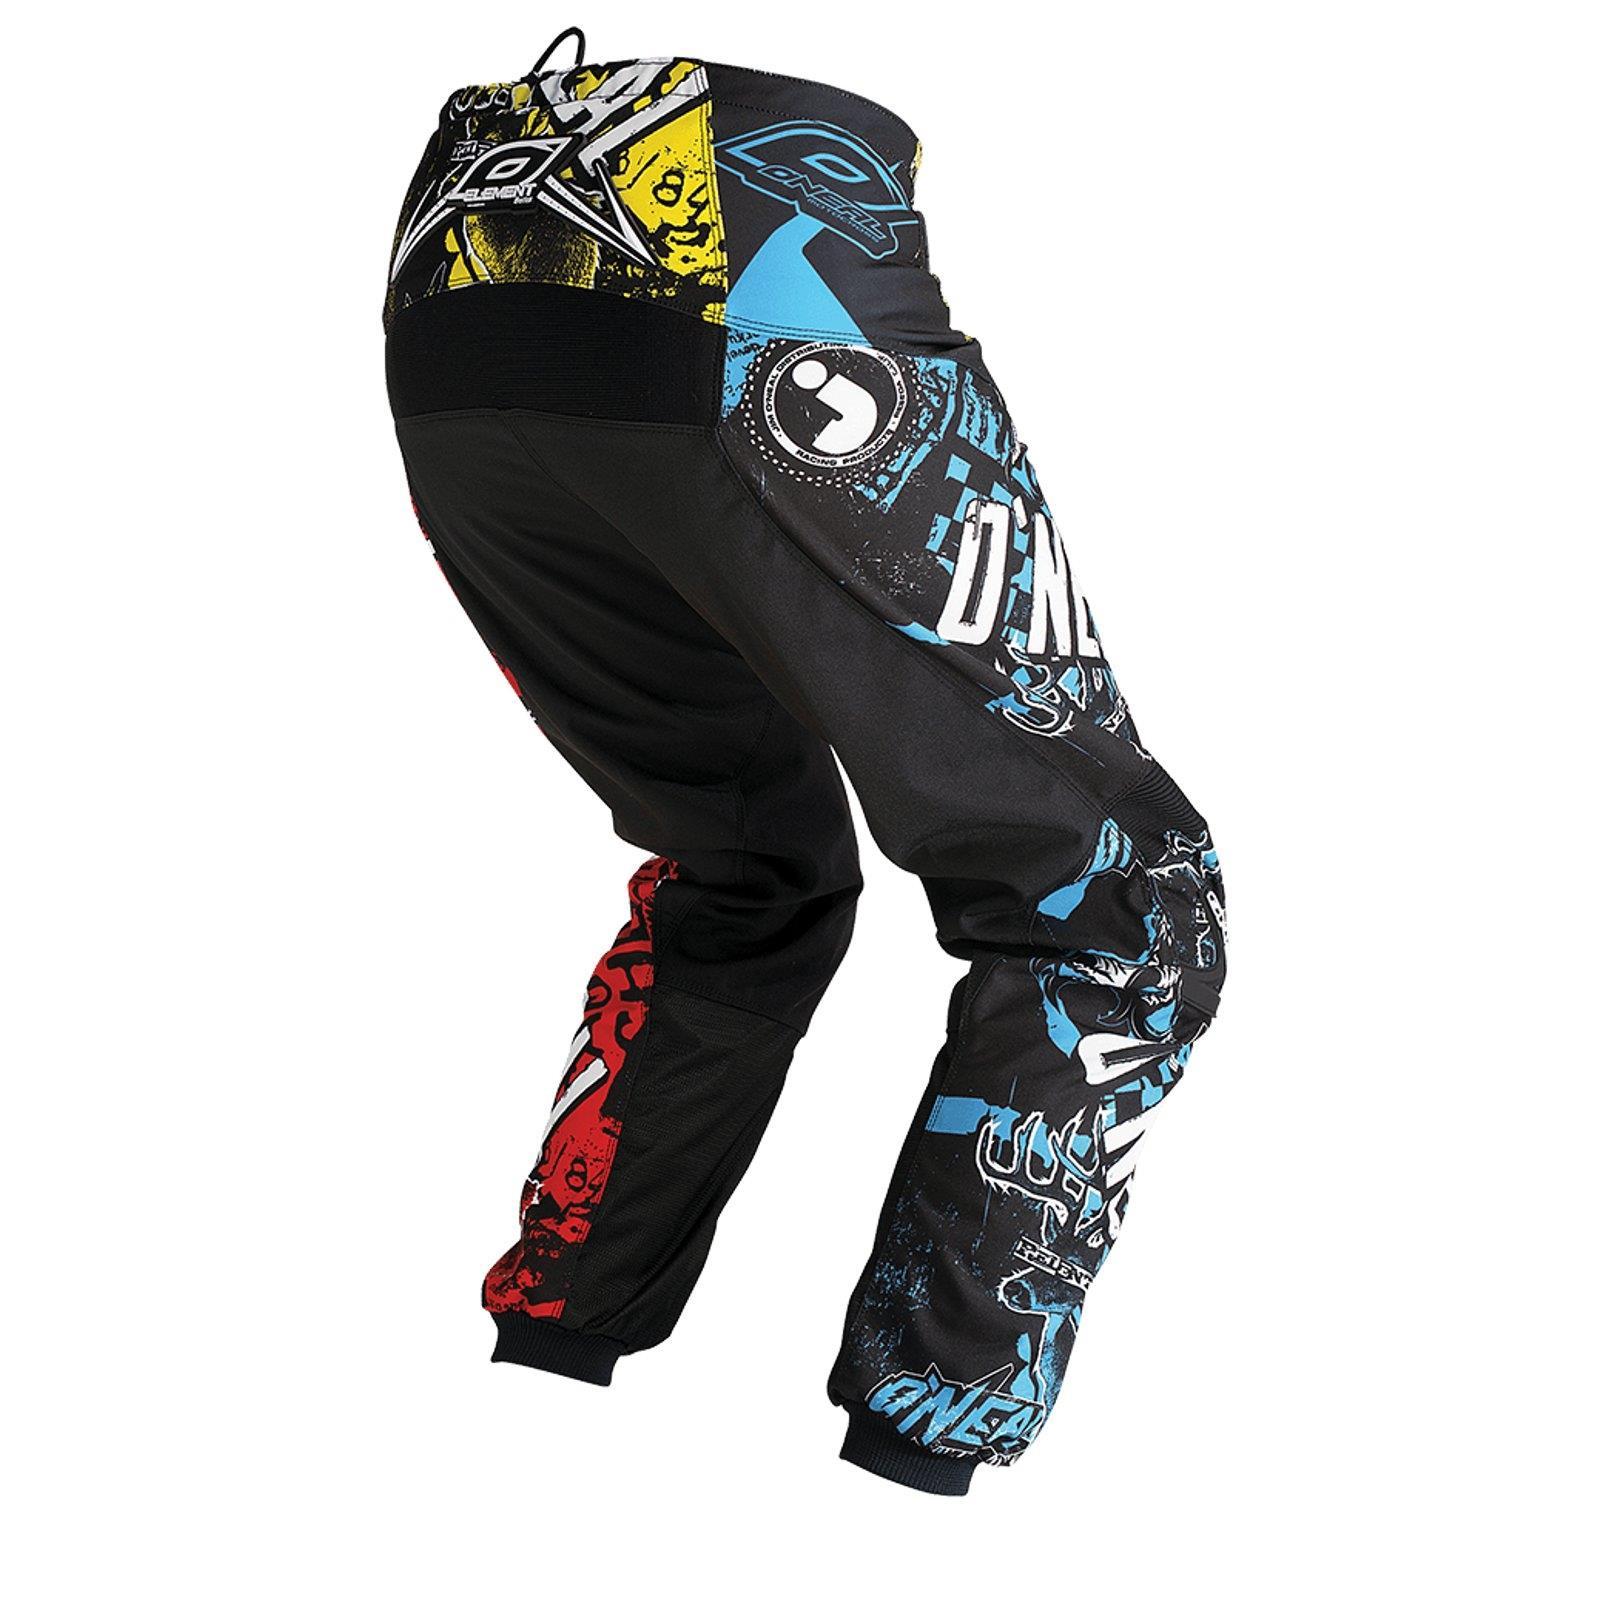 ONeal-pantalones-de-Jersey-de-los-ninos-de-pantalones-cortos-ninos-MX-bicicleta-DH-montana-bicicleta miniatura 30